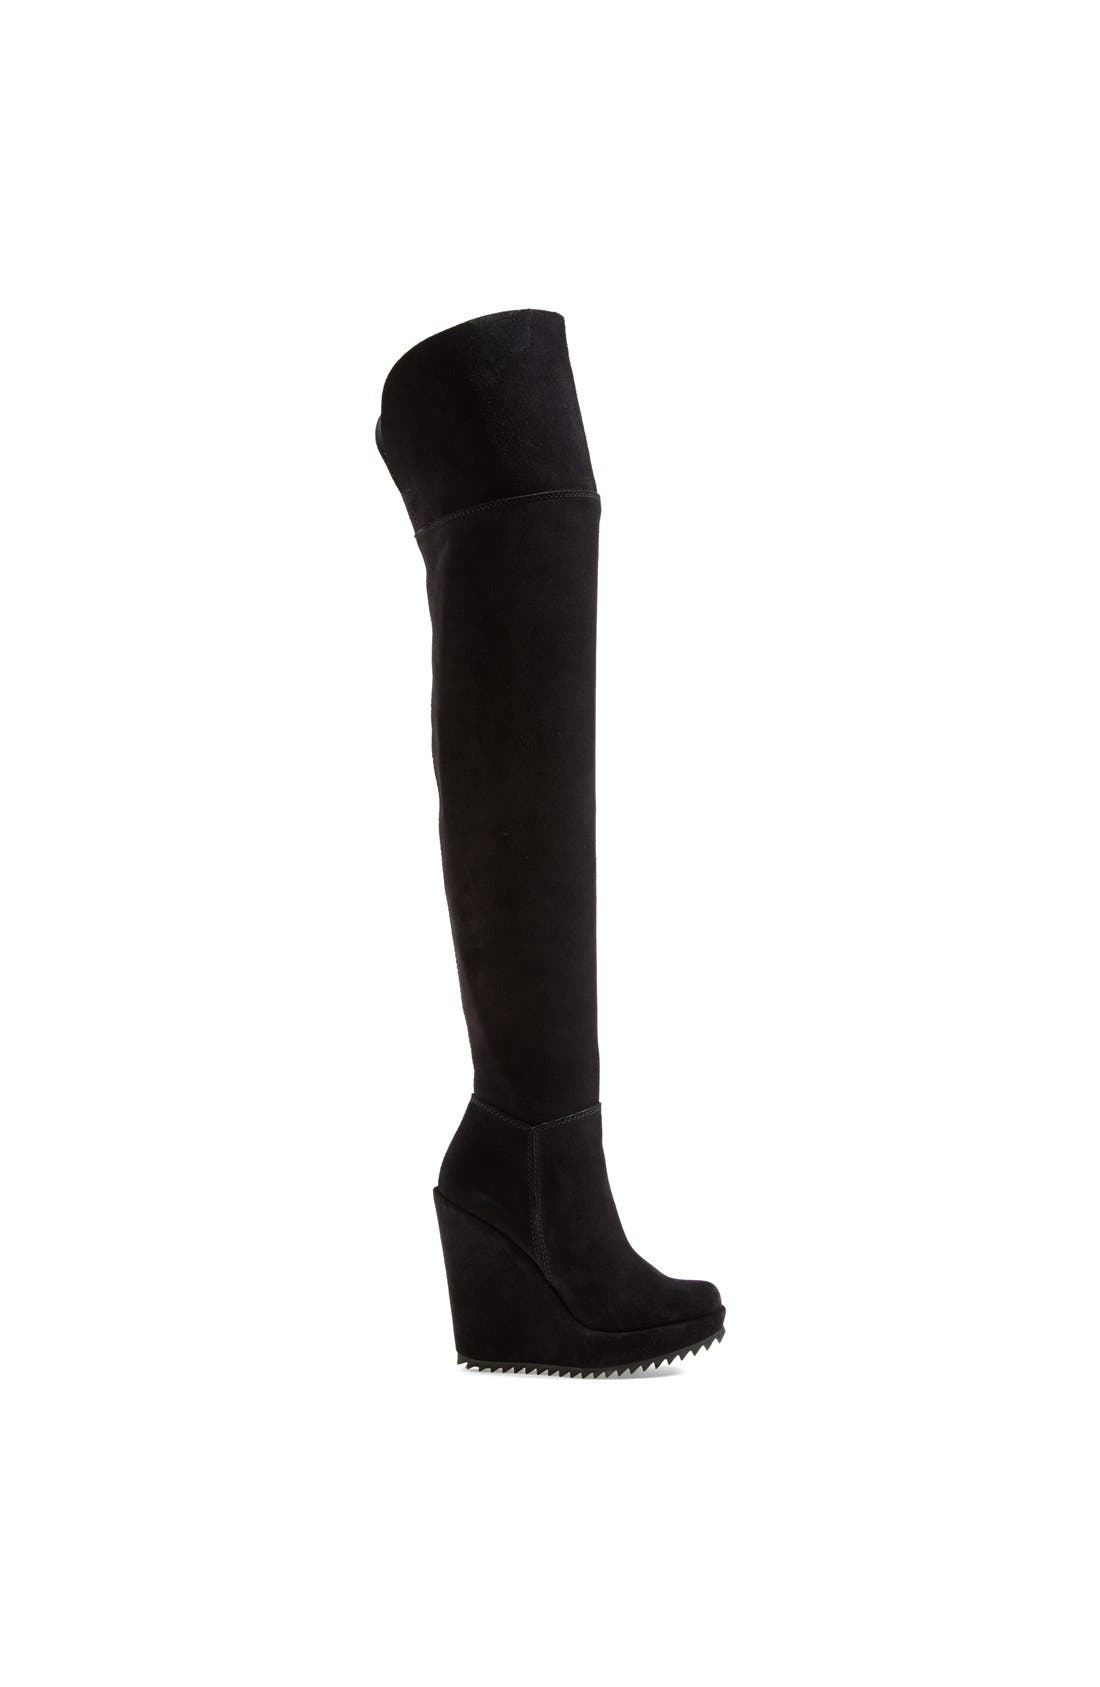 'Vanne' Over-the-Knee Boot,                             Alternate thumbnail 4, color,                             Black